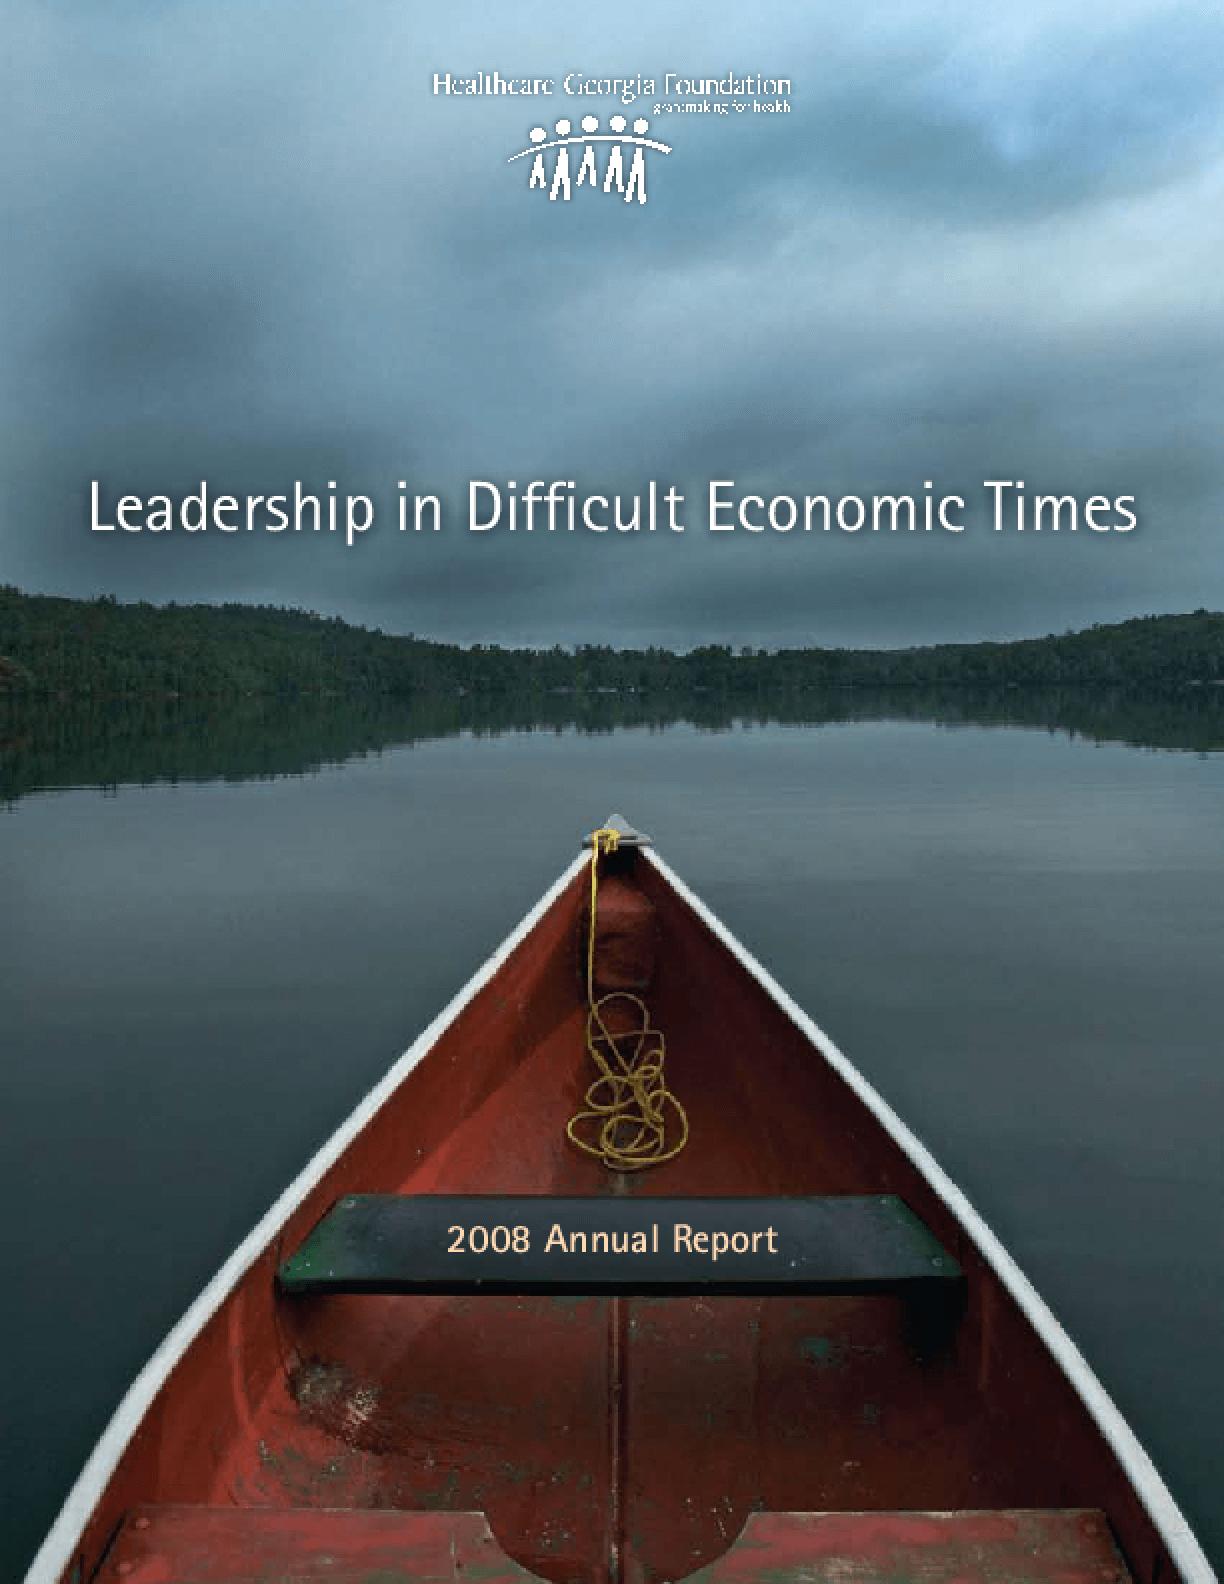 HealthCare Georgia Foundation - 2008 Annual Report